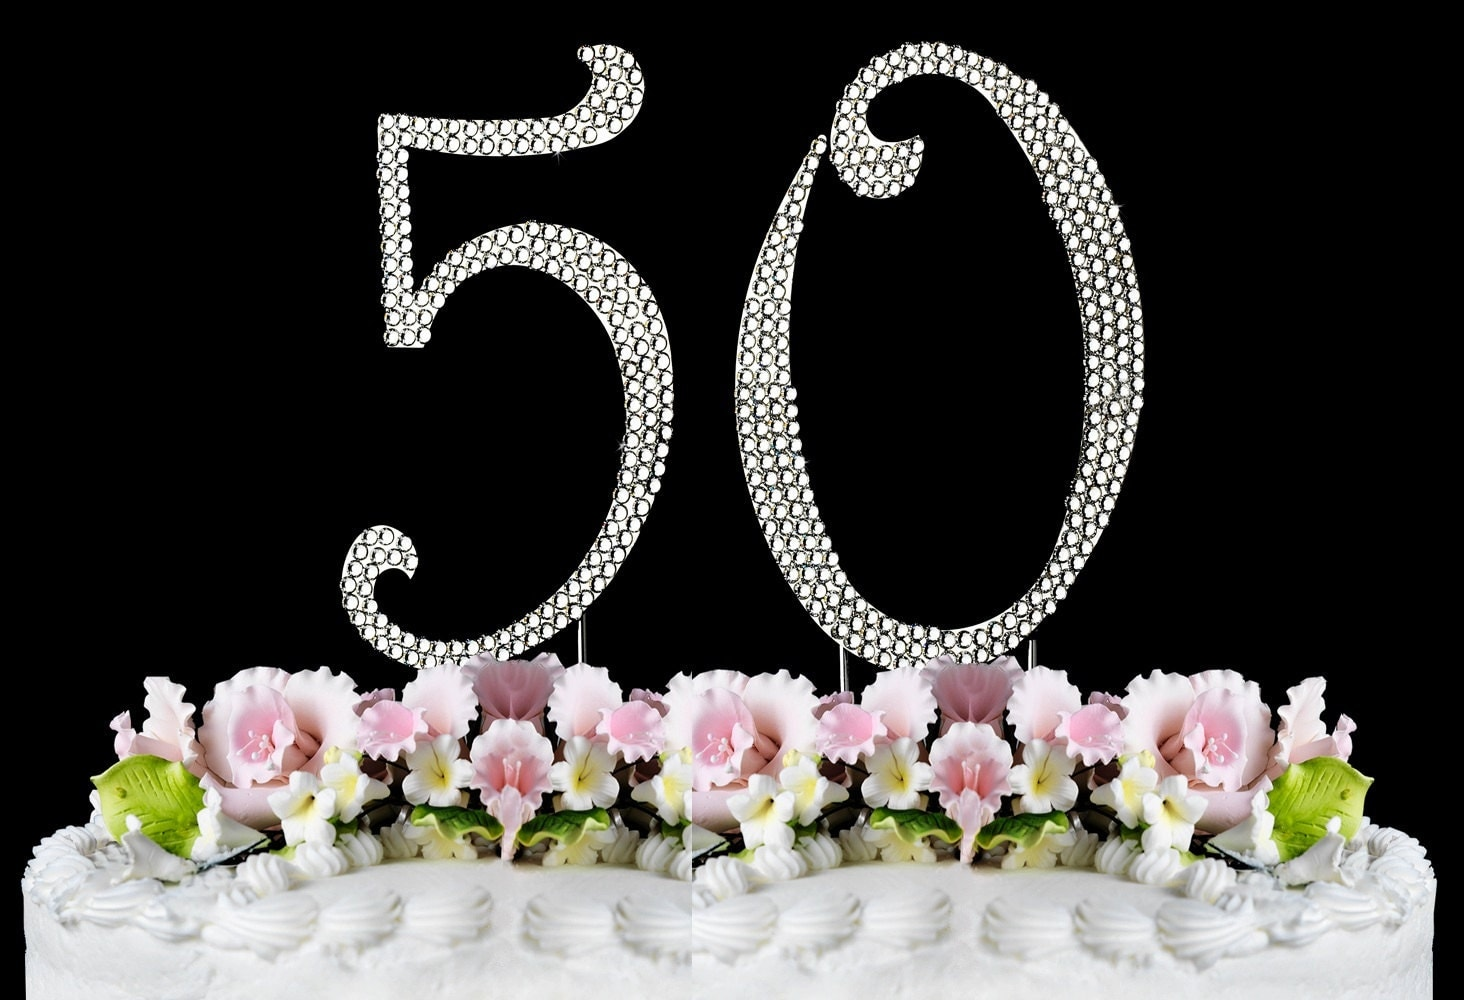 New Large Rhinestone NUMBER 50 Cake Topper 50th Birthday